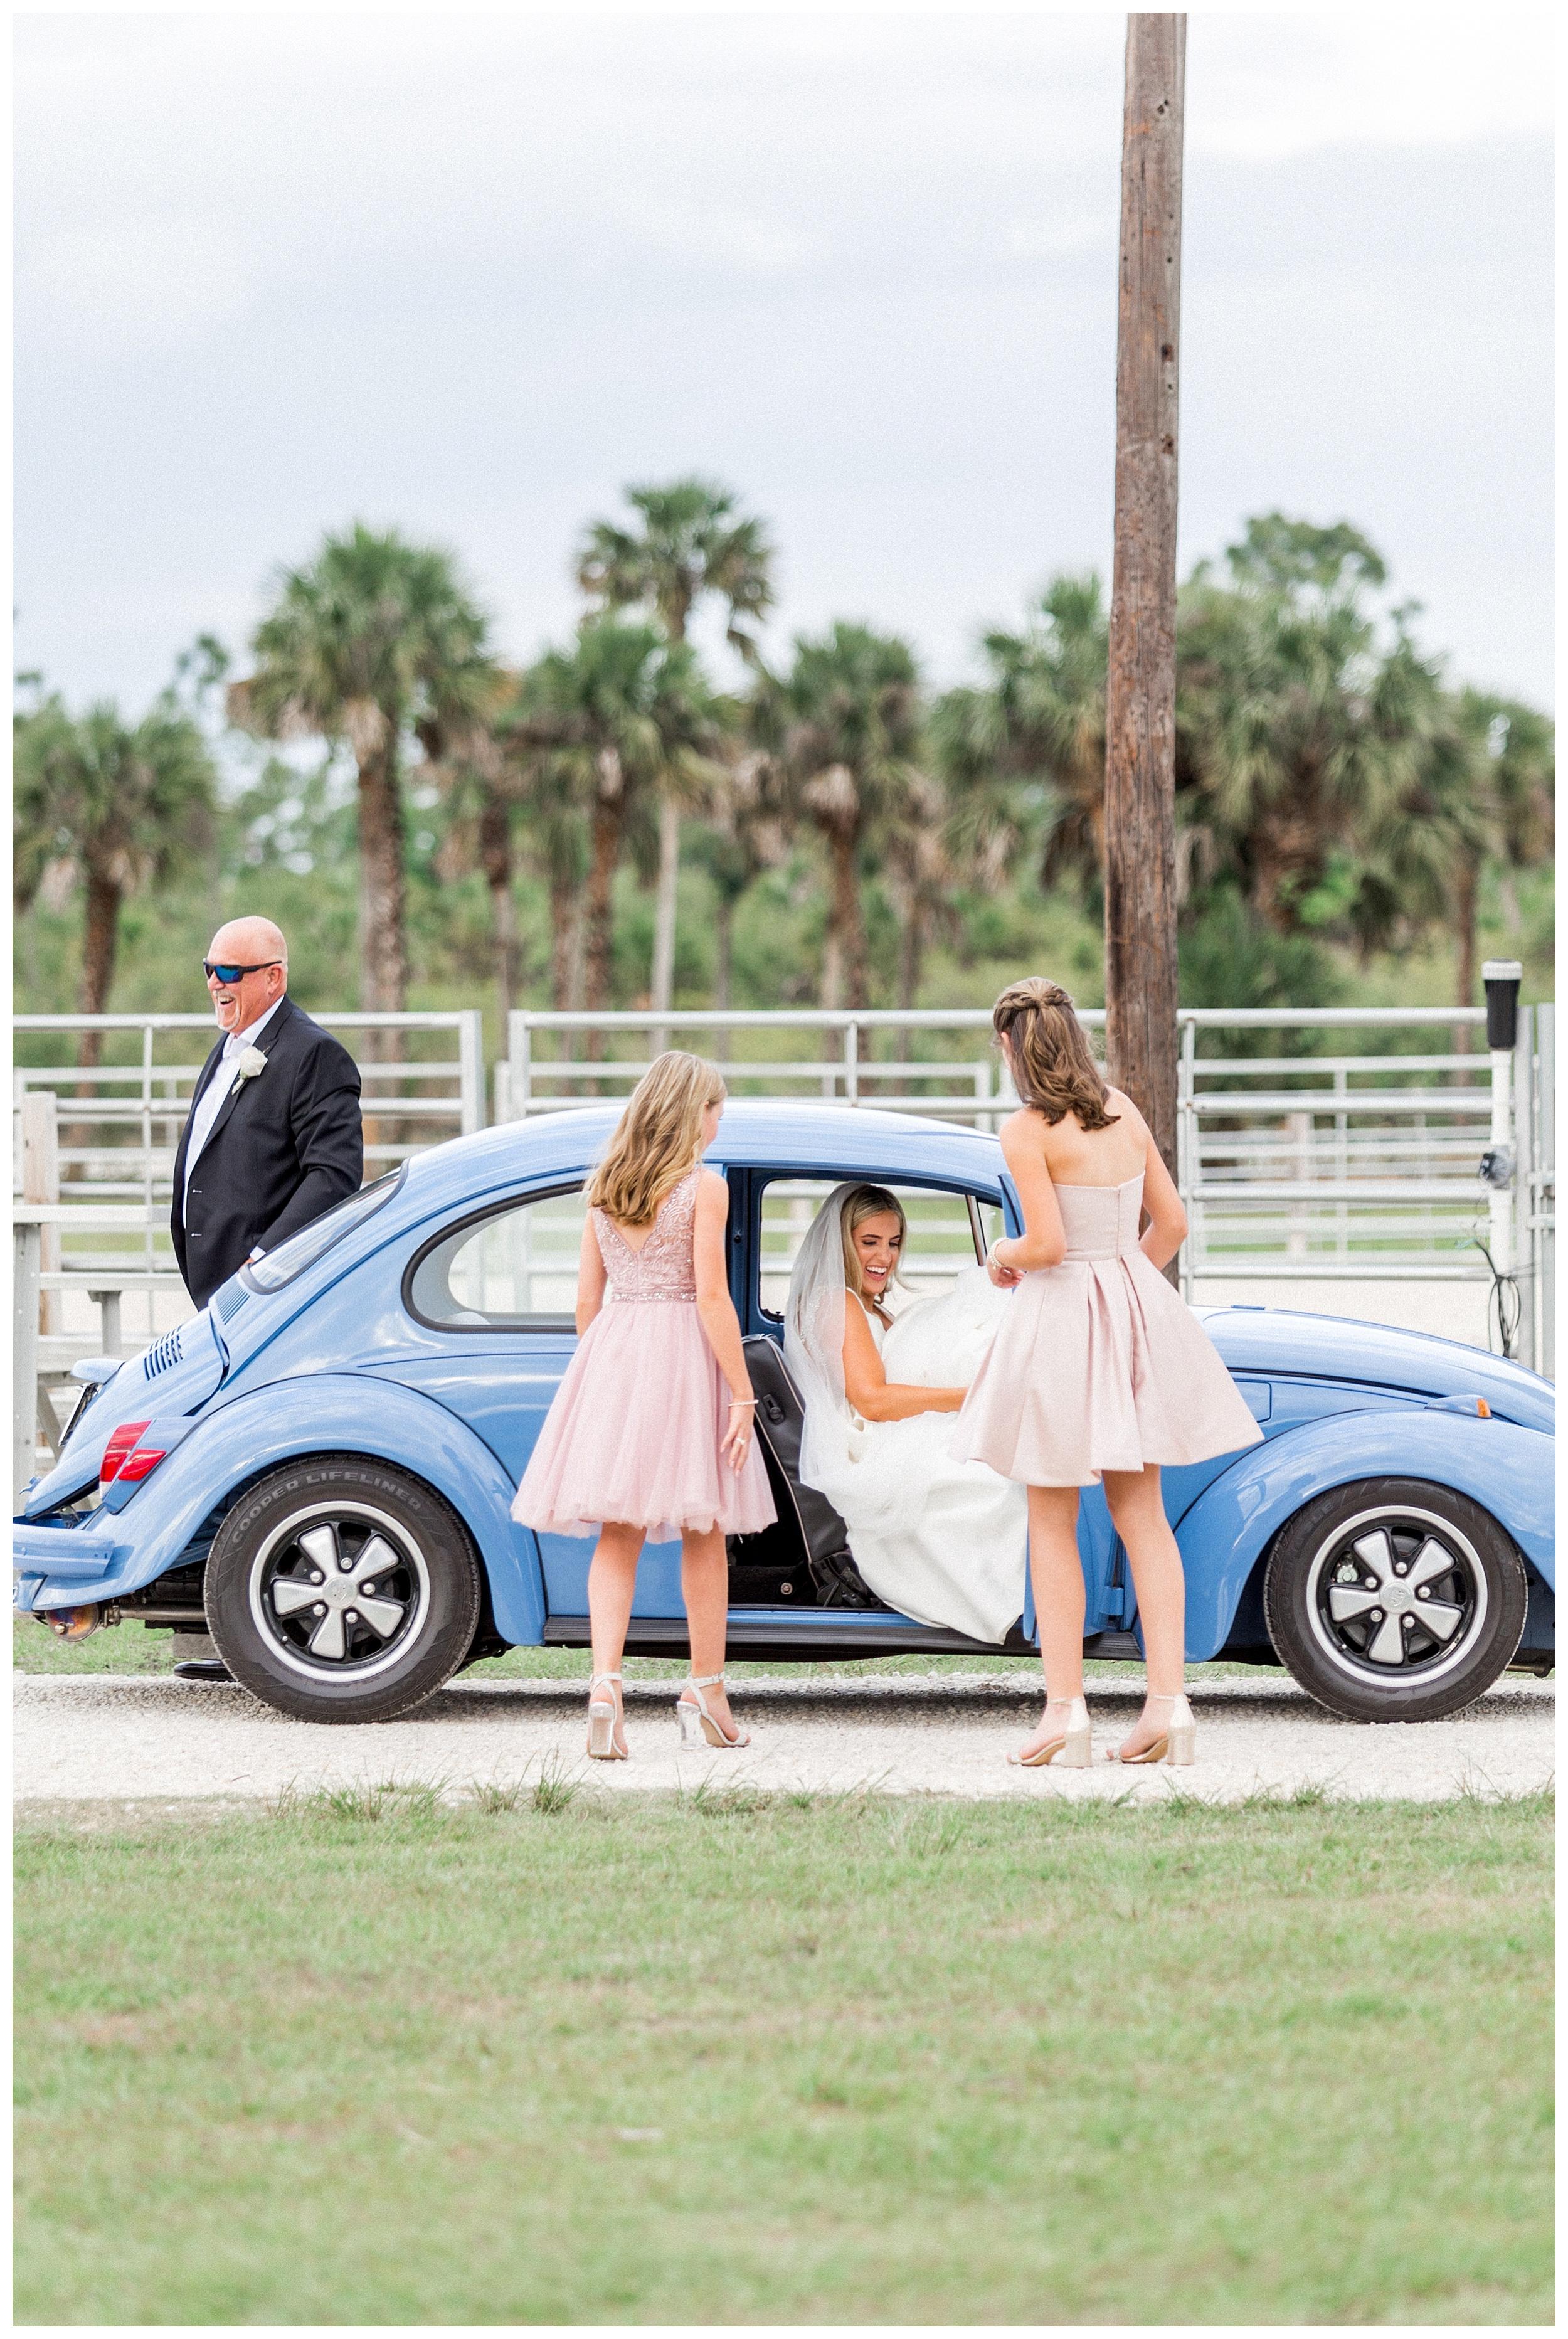 South Florida Wedding Photographer Kir Tuben_0073.jpg